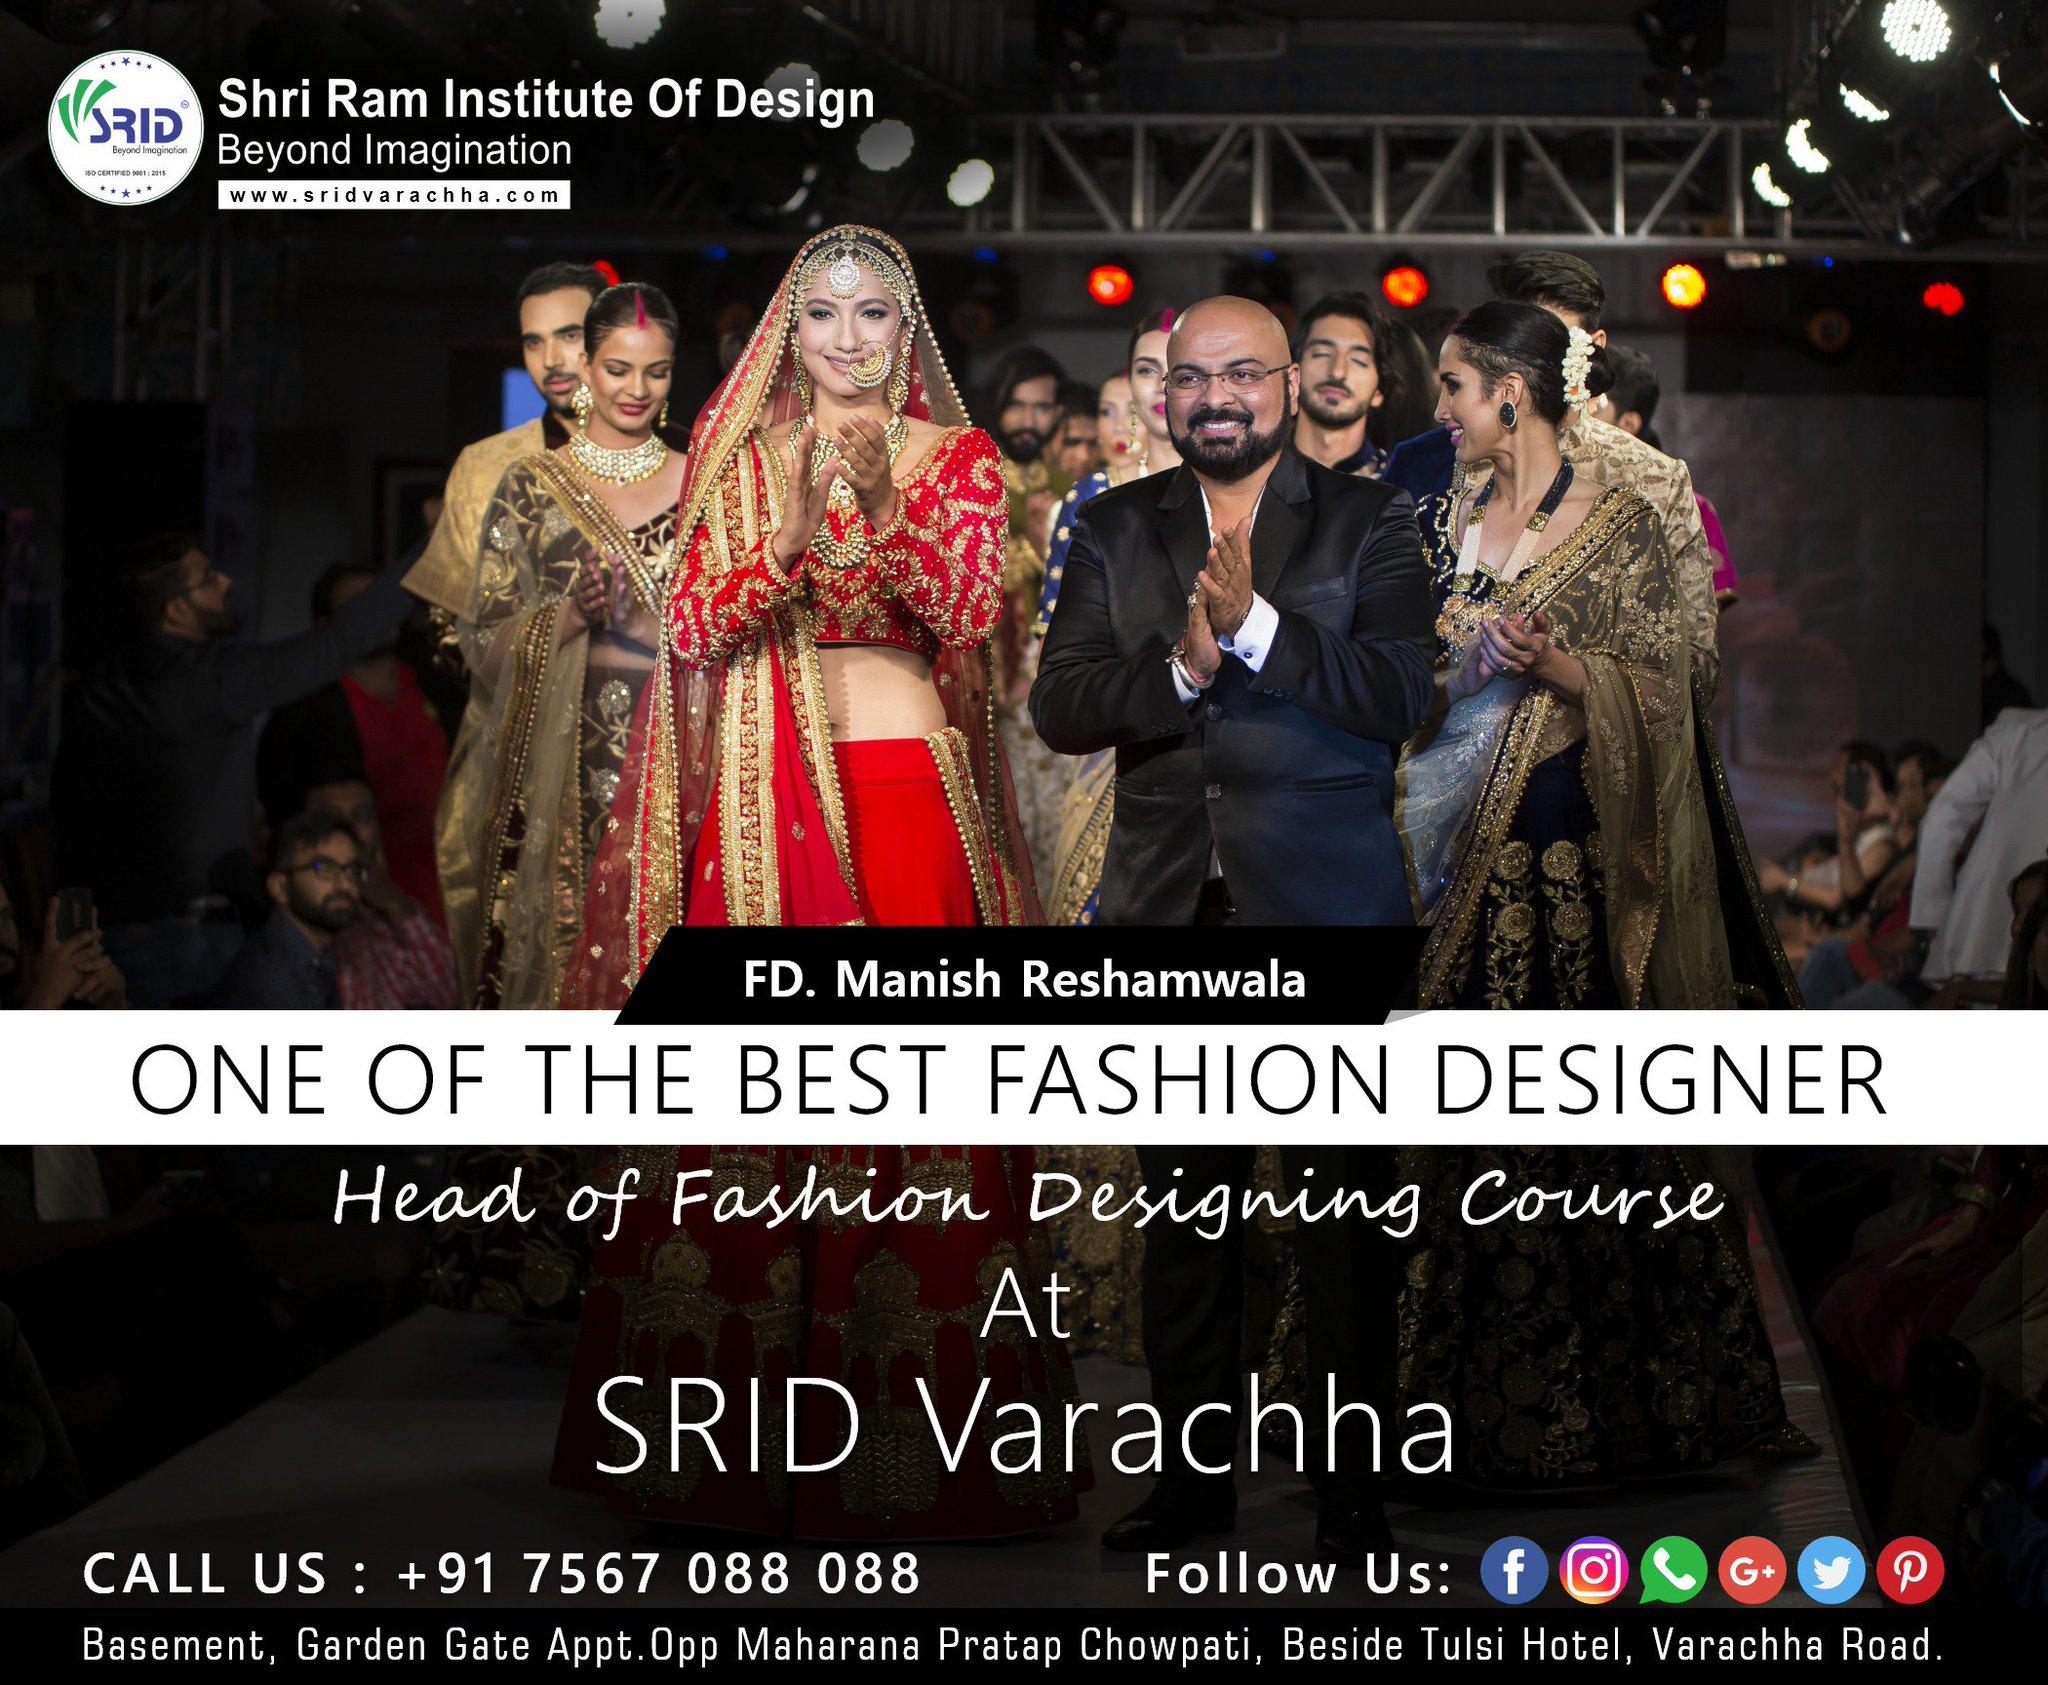 Srid Varachha On Twitter Admission Fashion Fashionista Fashiondesign Myfashion Drawing Design Indianfashion Interiors Styling Styles Stylemepretty Streetstyle Instastyle Interiordesign Homedecor Vastushastra Followforfollow